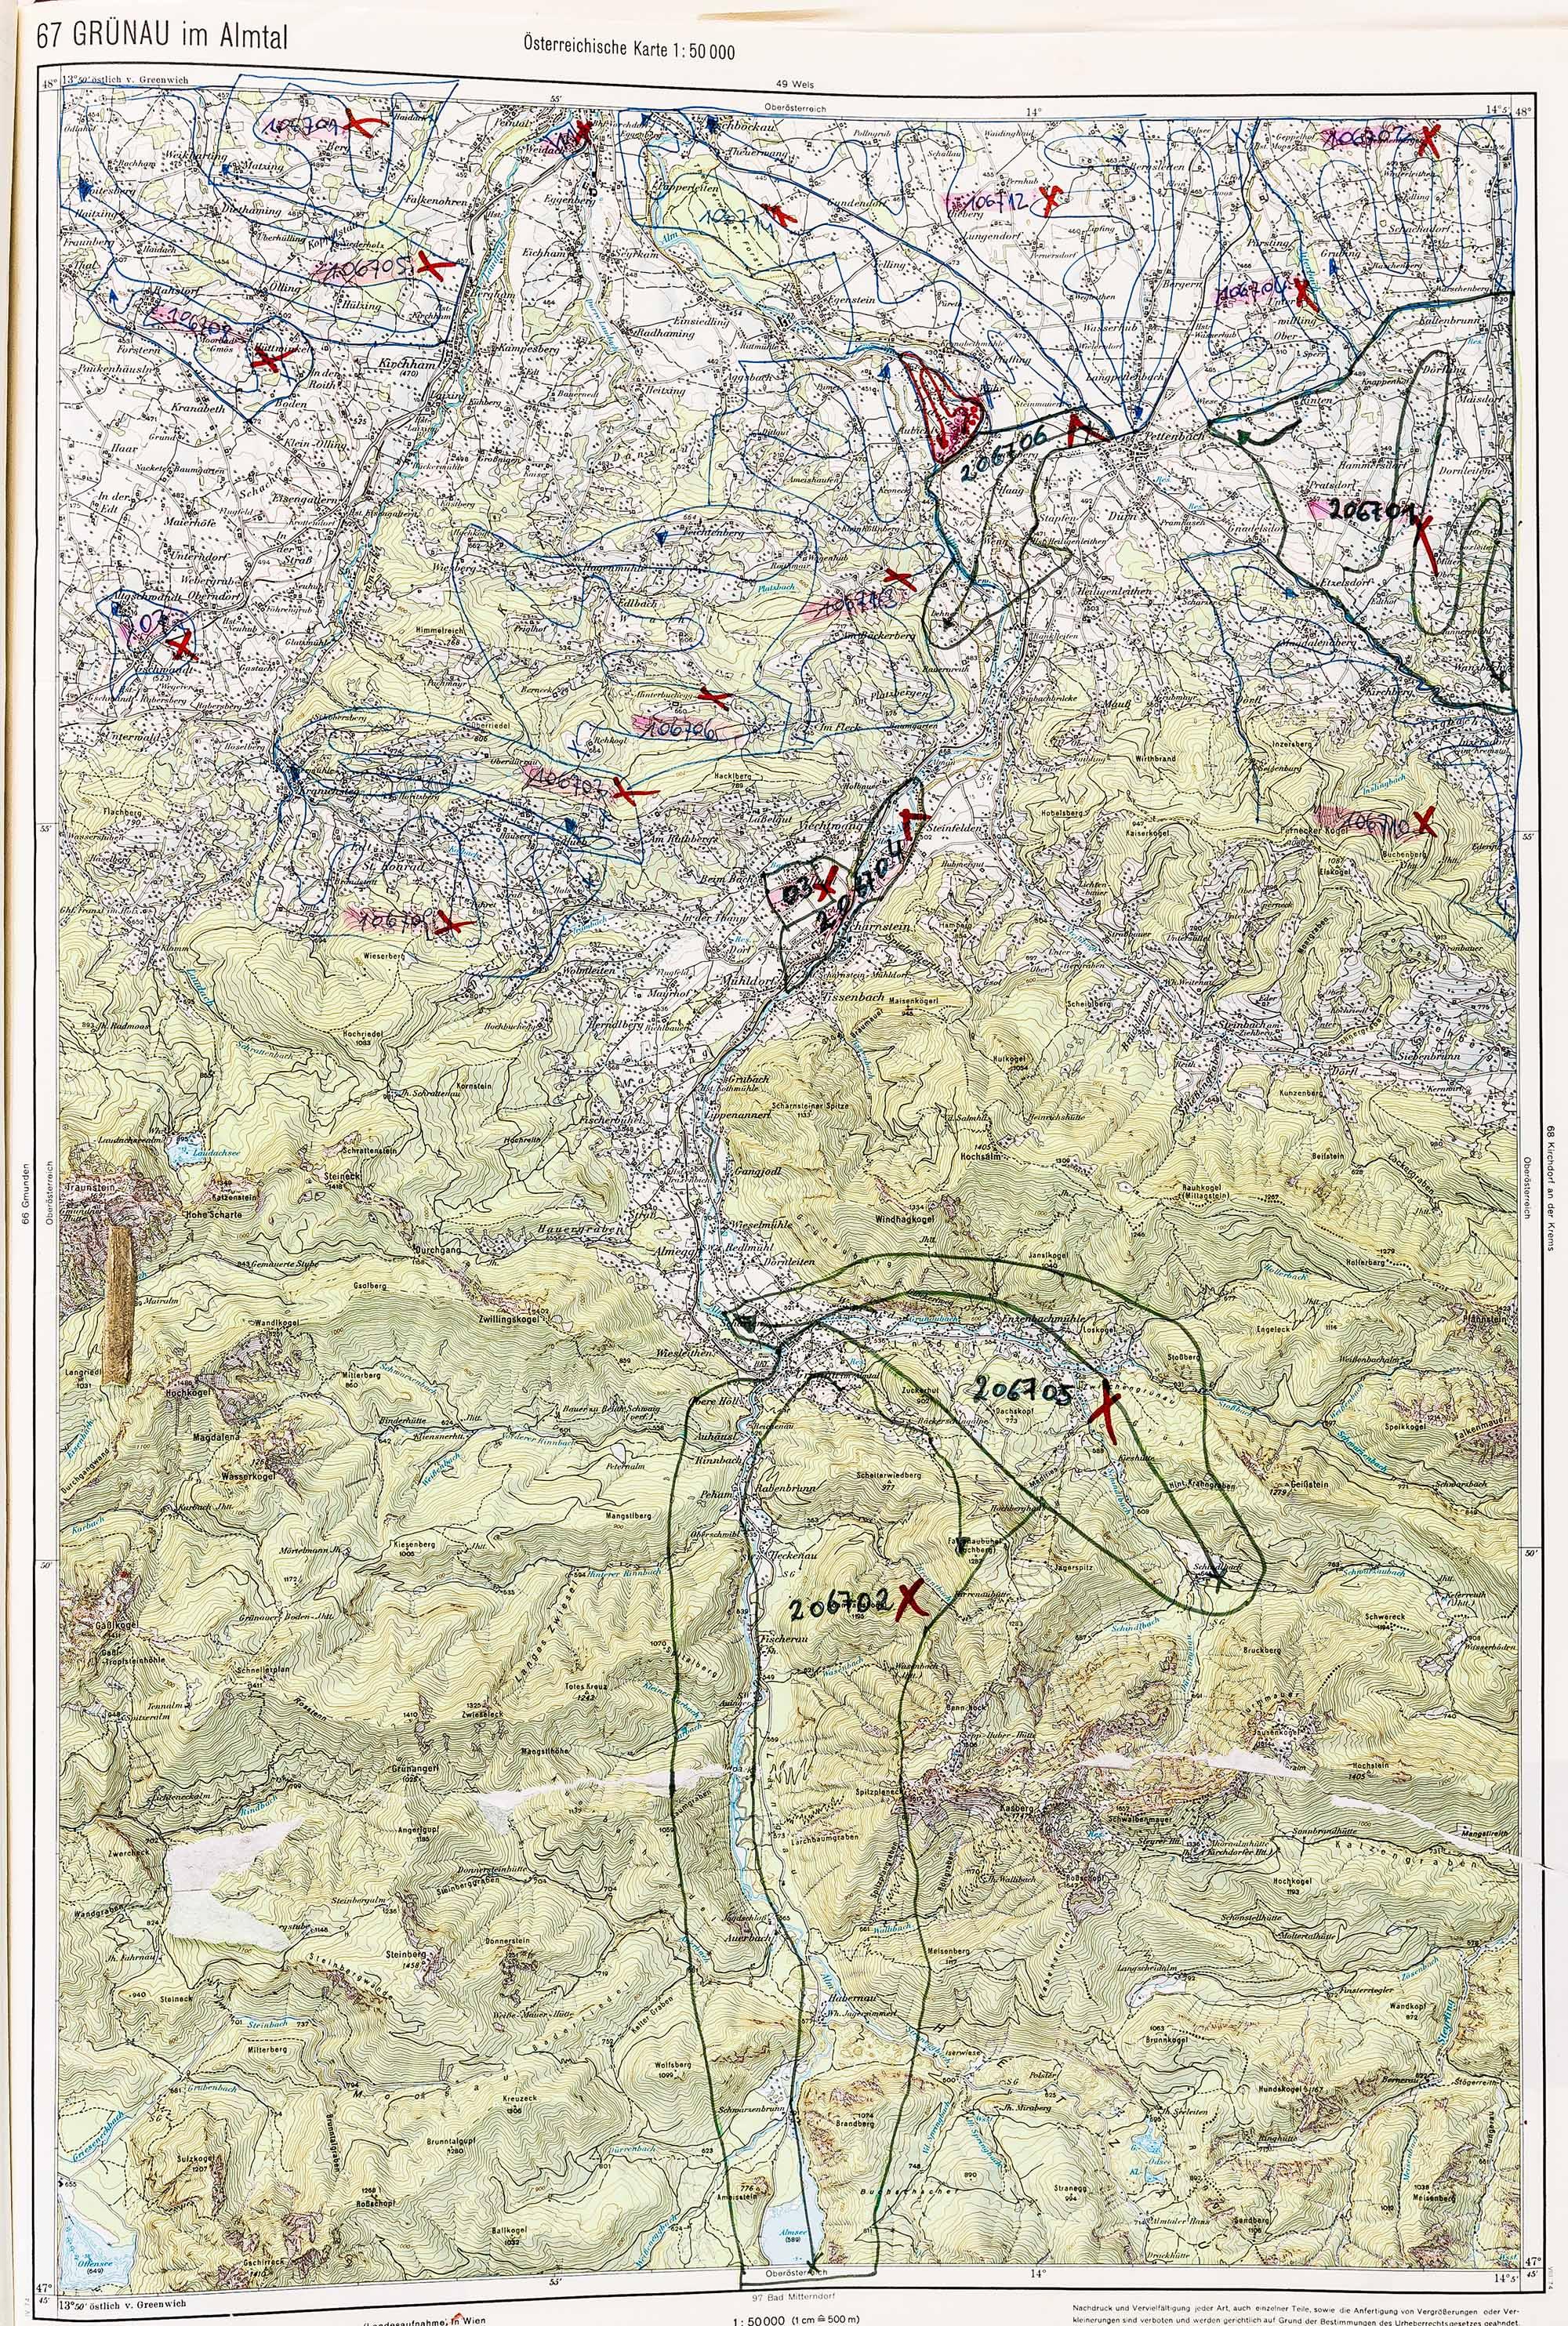 1979-1982 Karte 067